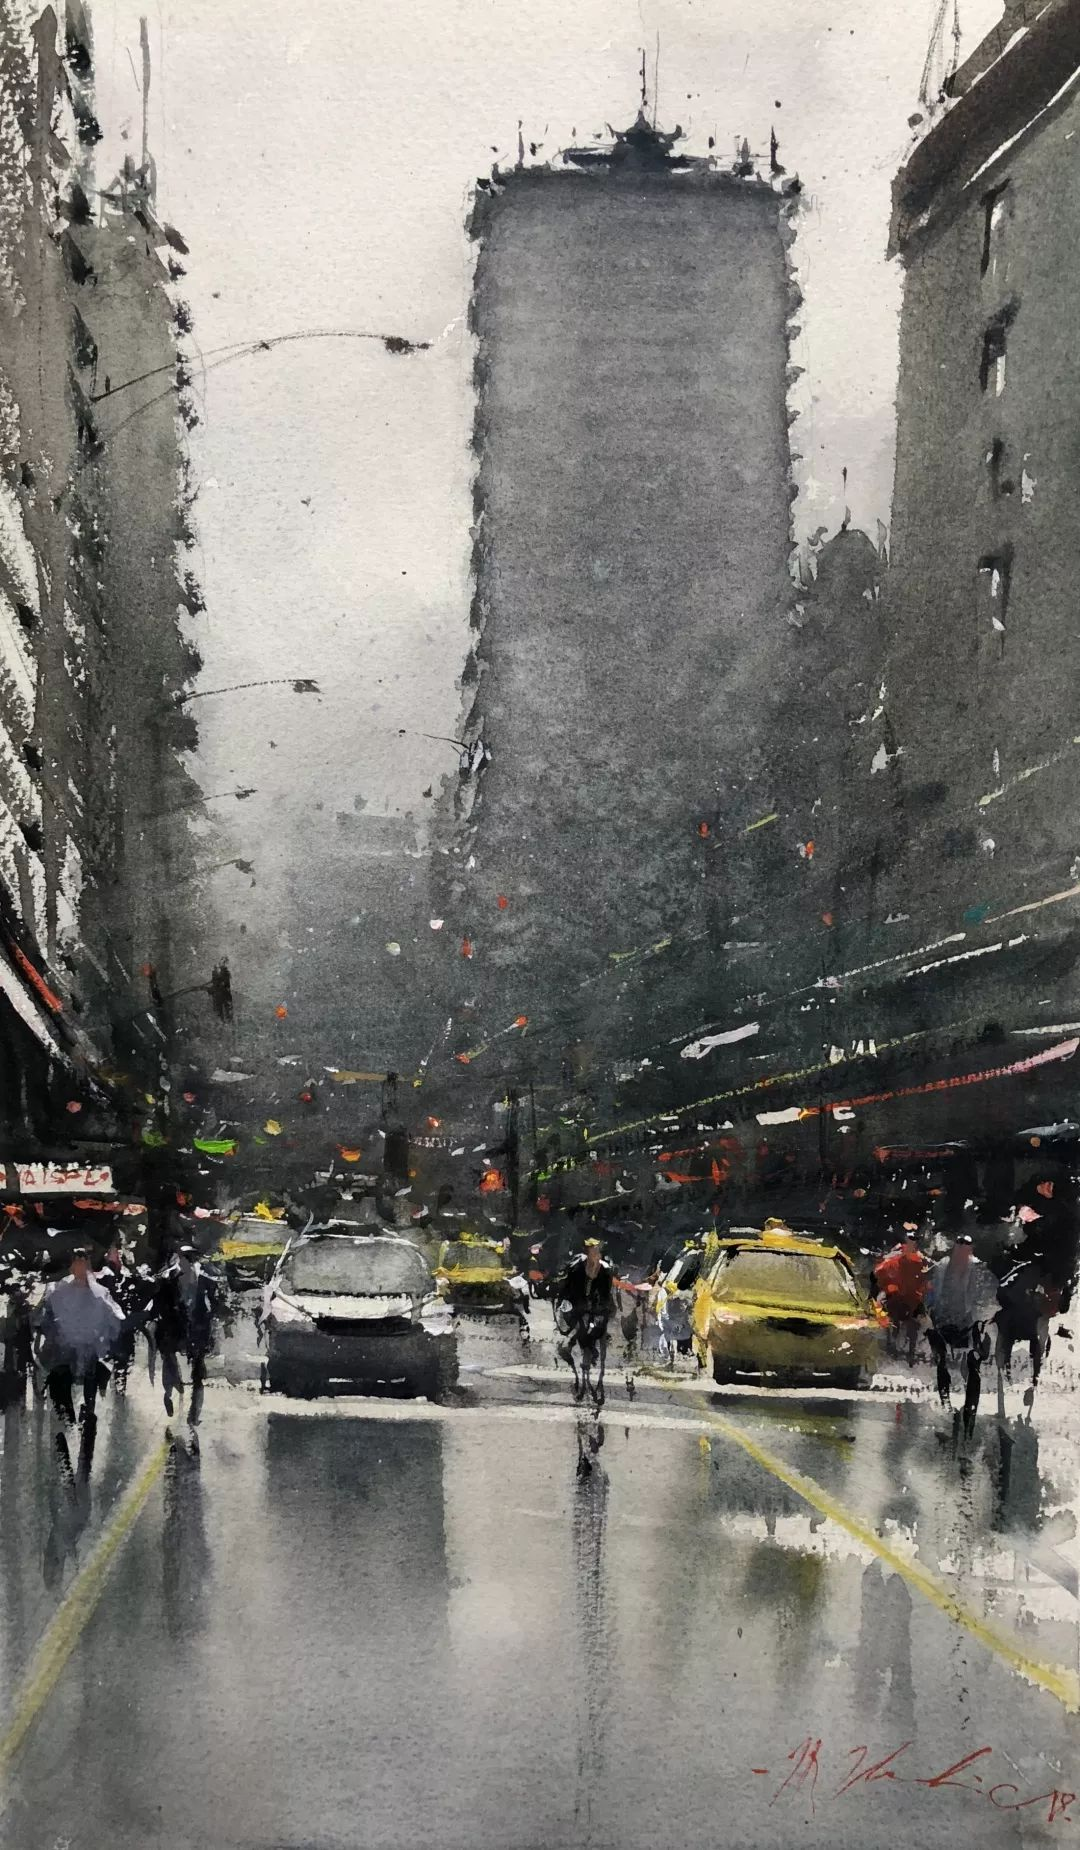 Joseph Zbukvic in 2020 | Watercolor city. Painting still life. Watercolor landscape